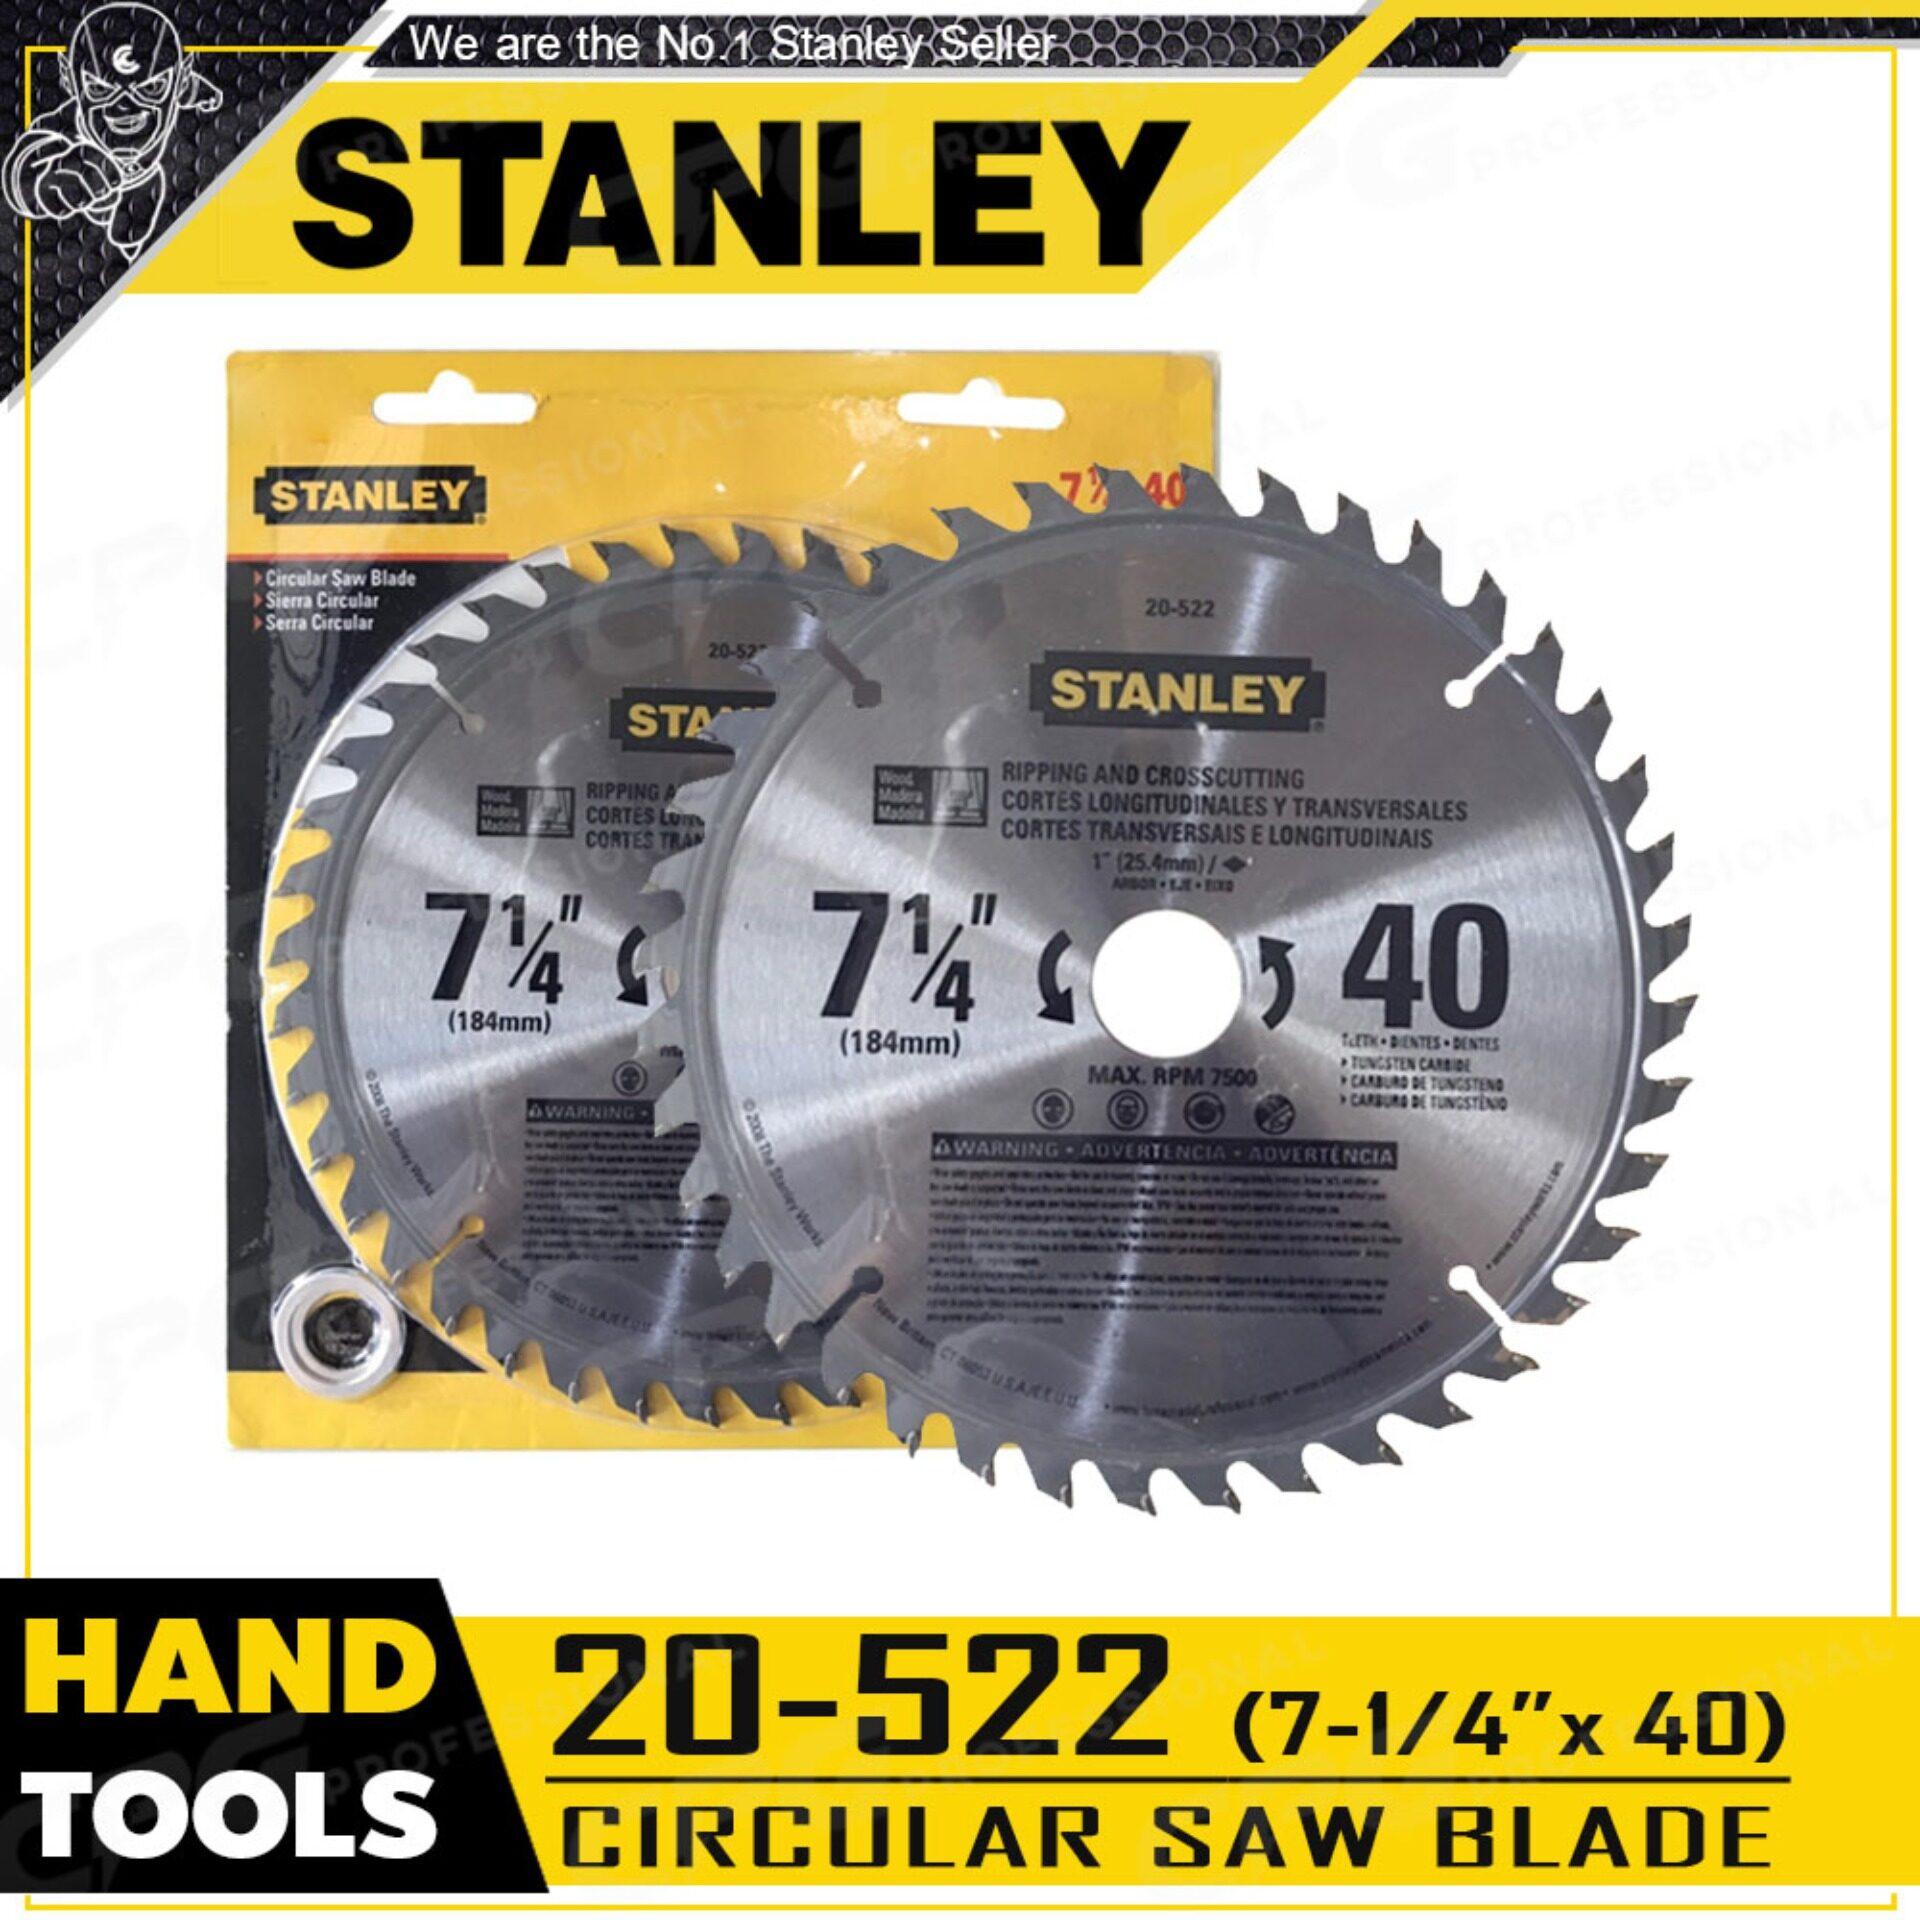 STANLEY ใบเลื่อยวงเดือน 7 1/4 นิ้ว x 40 ฟัน รหัส 20-522 ++ของแท้100%++